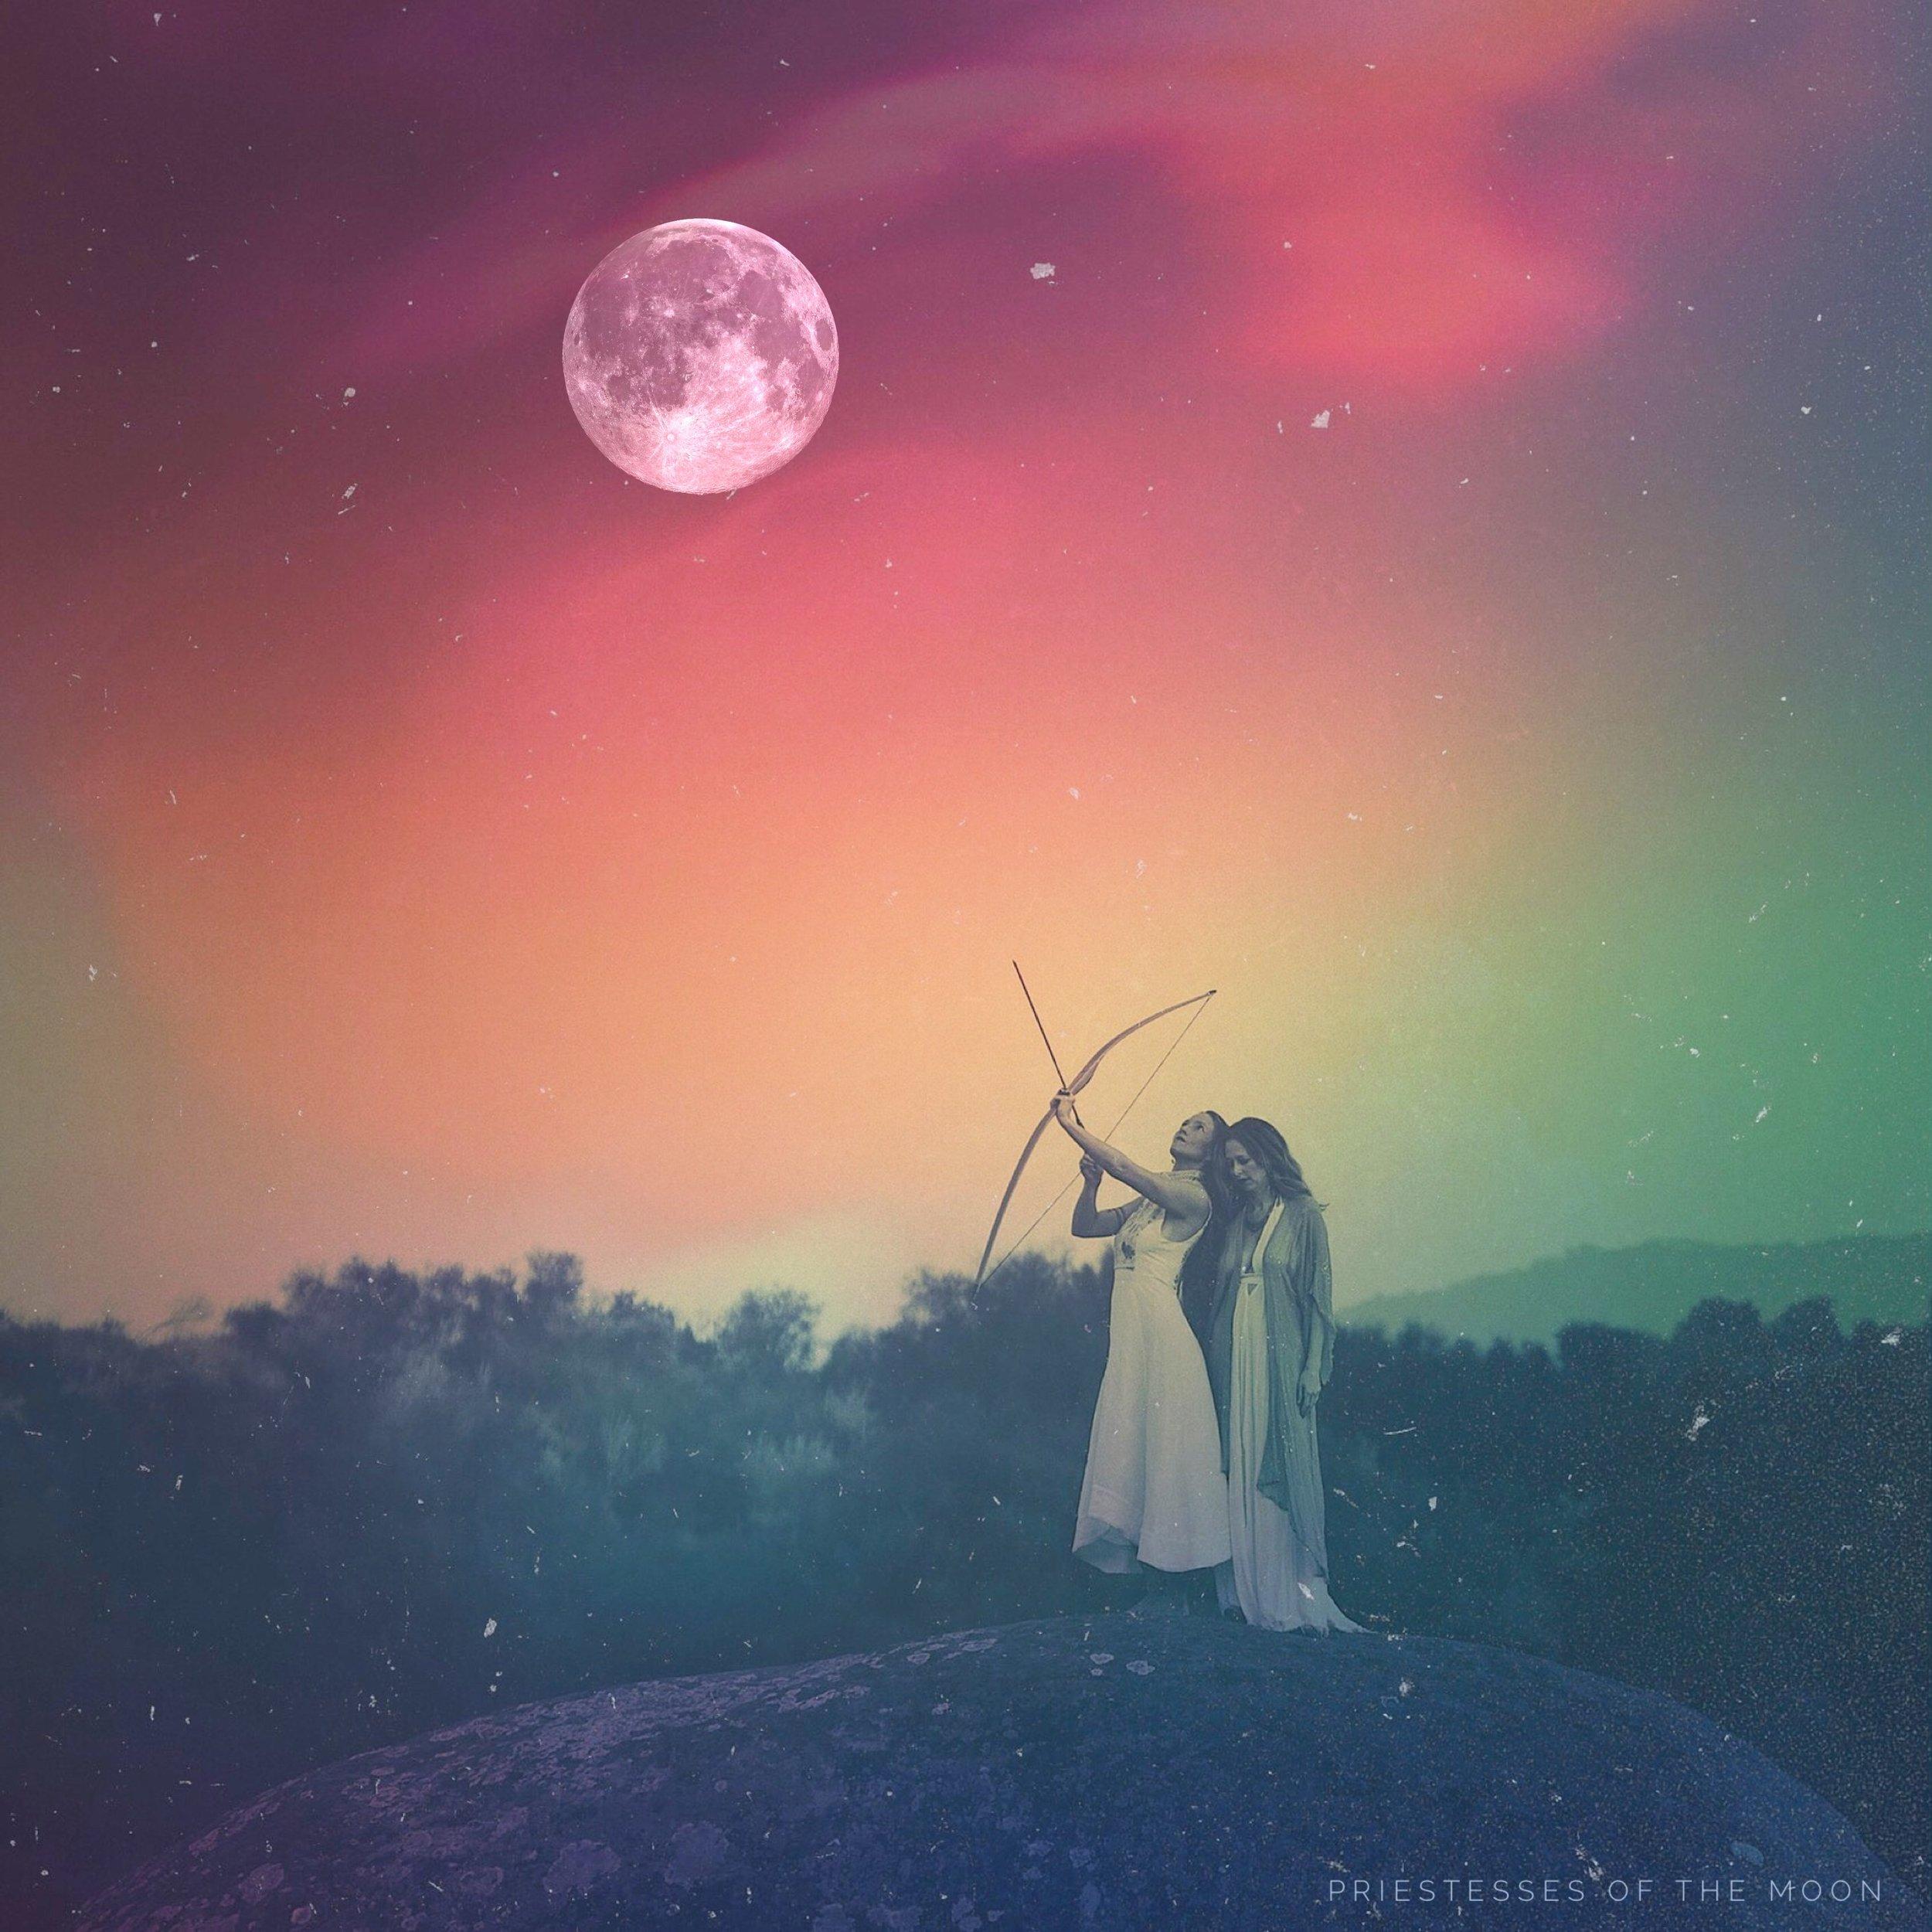 Pic of Achintya Devi & Joanna Ameya for Priestesses Of The Moon. Original by Mariana Schulze, Art Edits by Achintya.